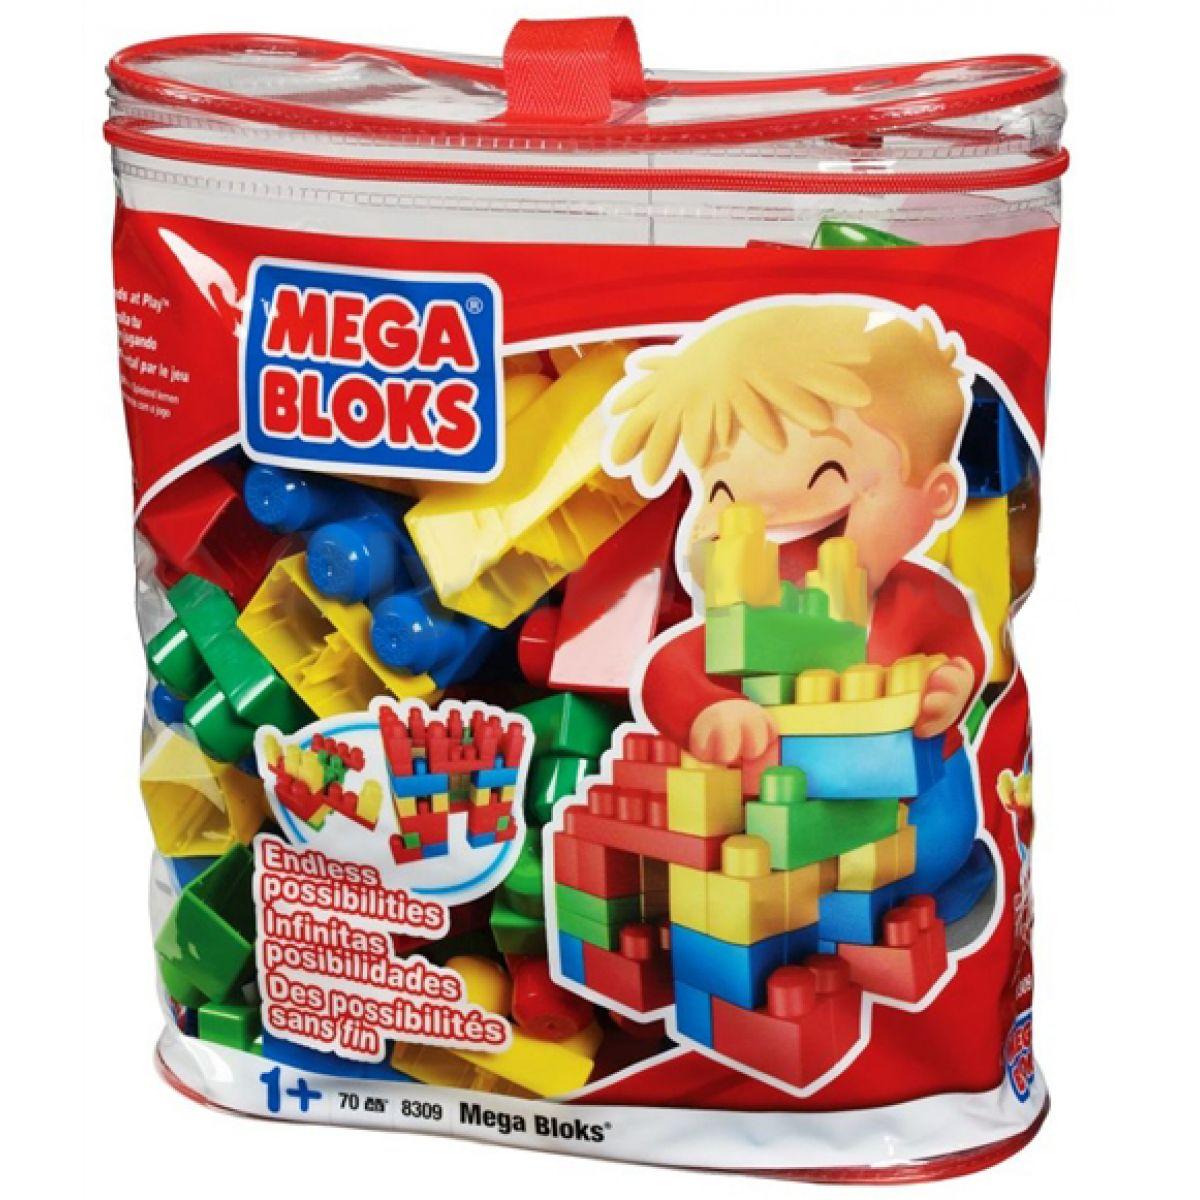 MEGABLOKS 8309 - 70 Mega Bloks kostek v plastovém pytli